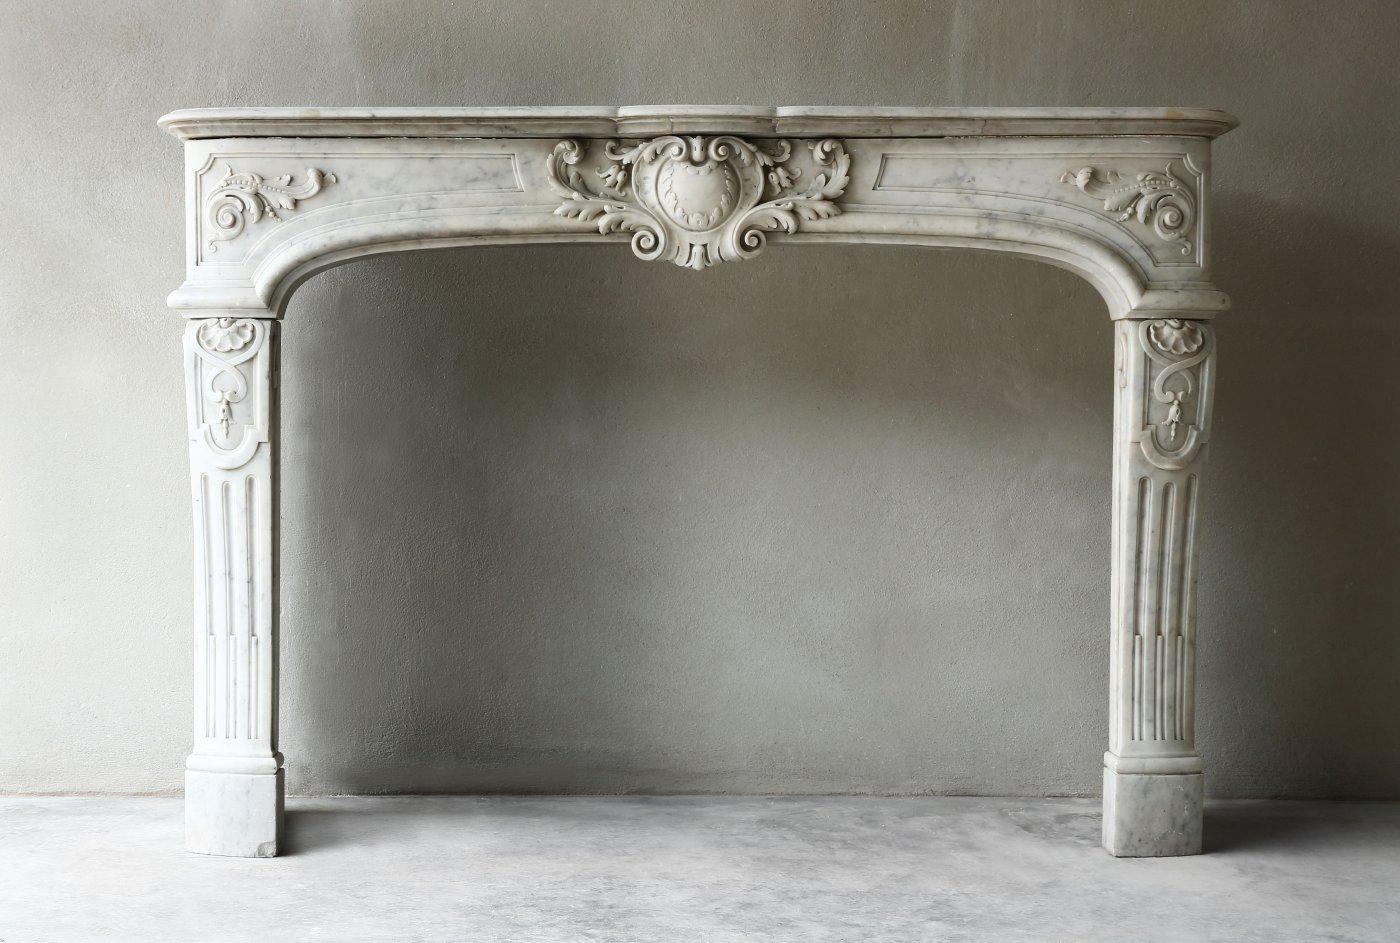 Antique Marble Fireplace De Opkamer Antique Floors And